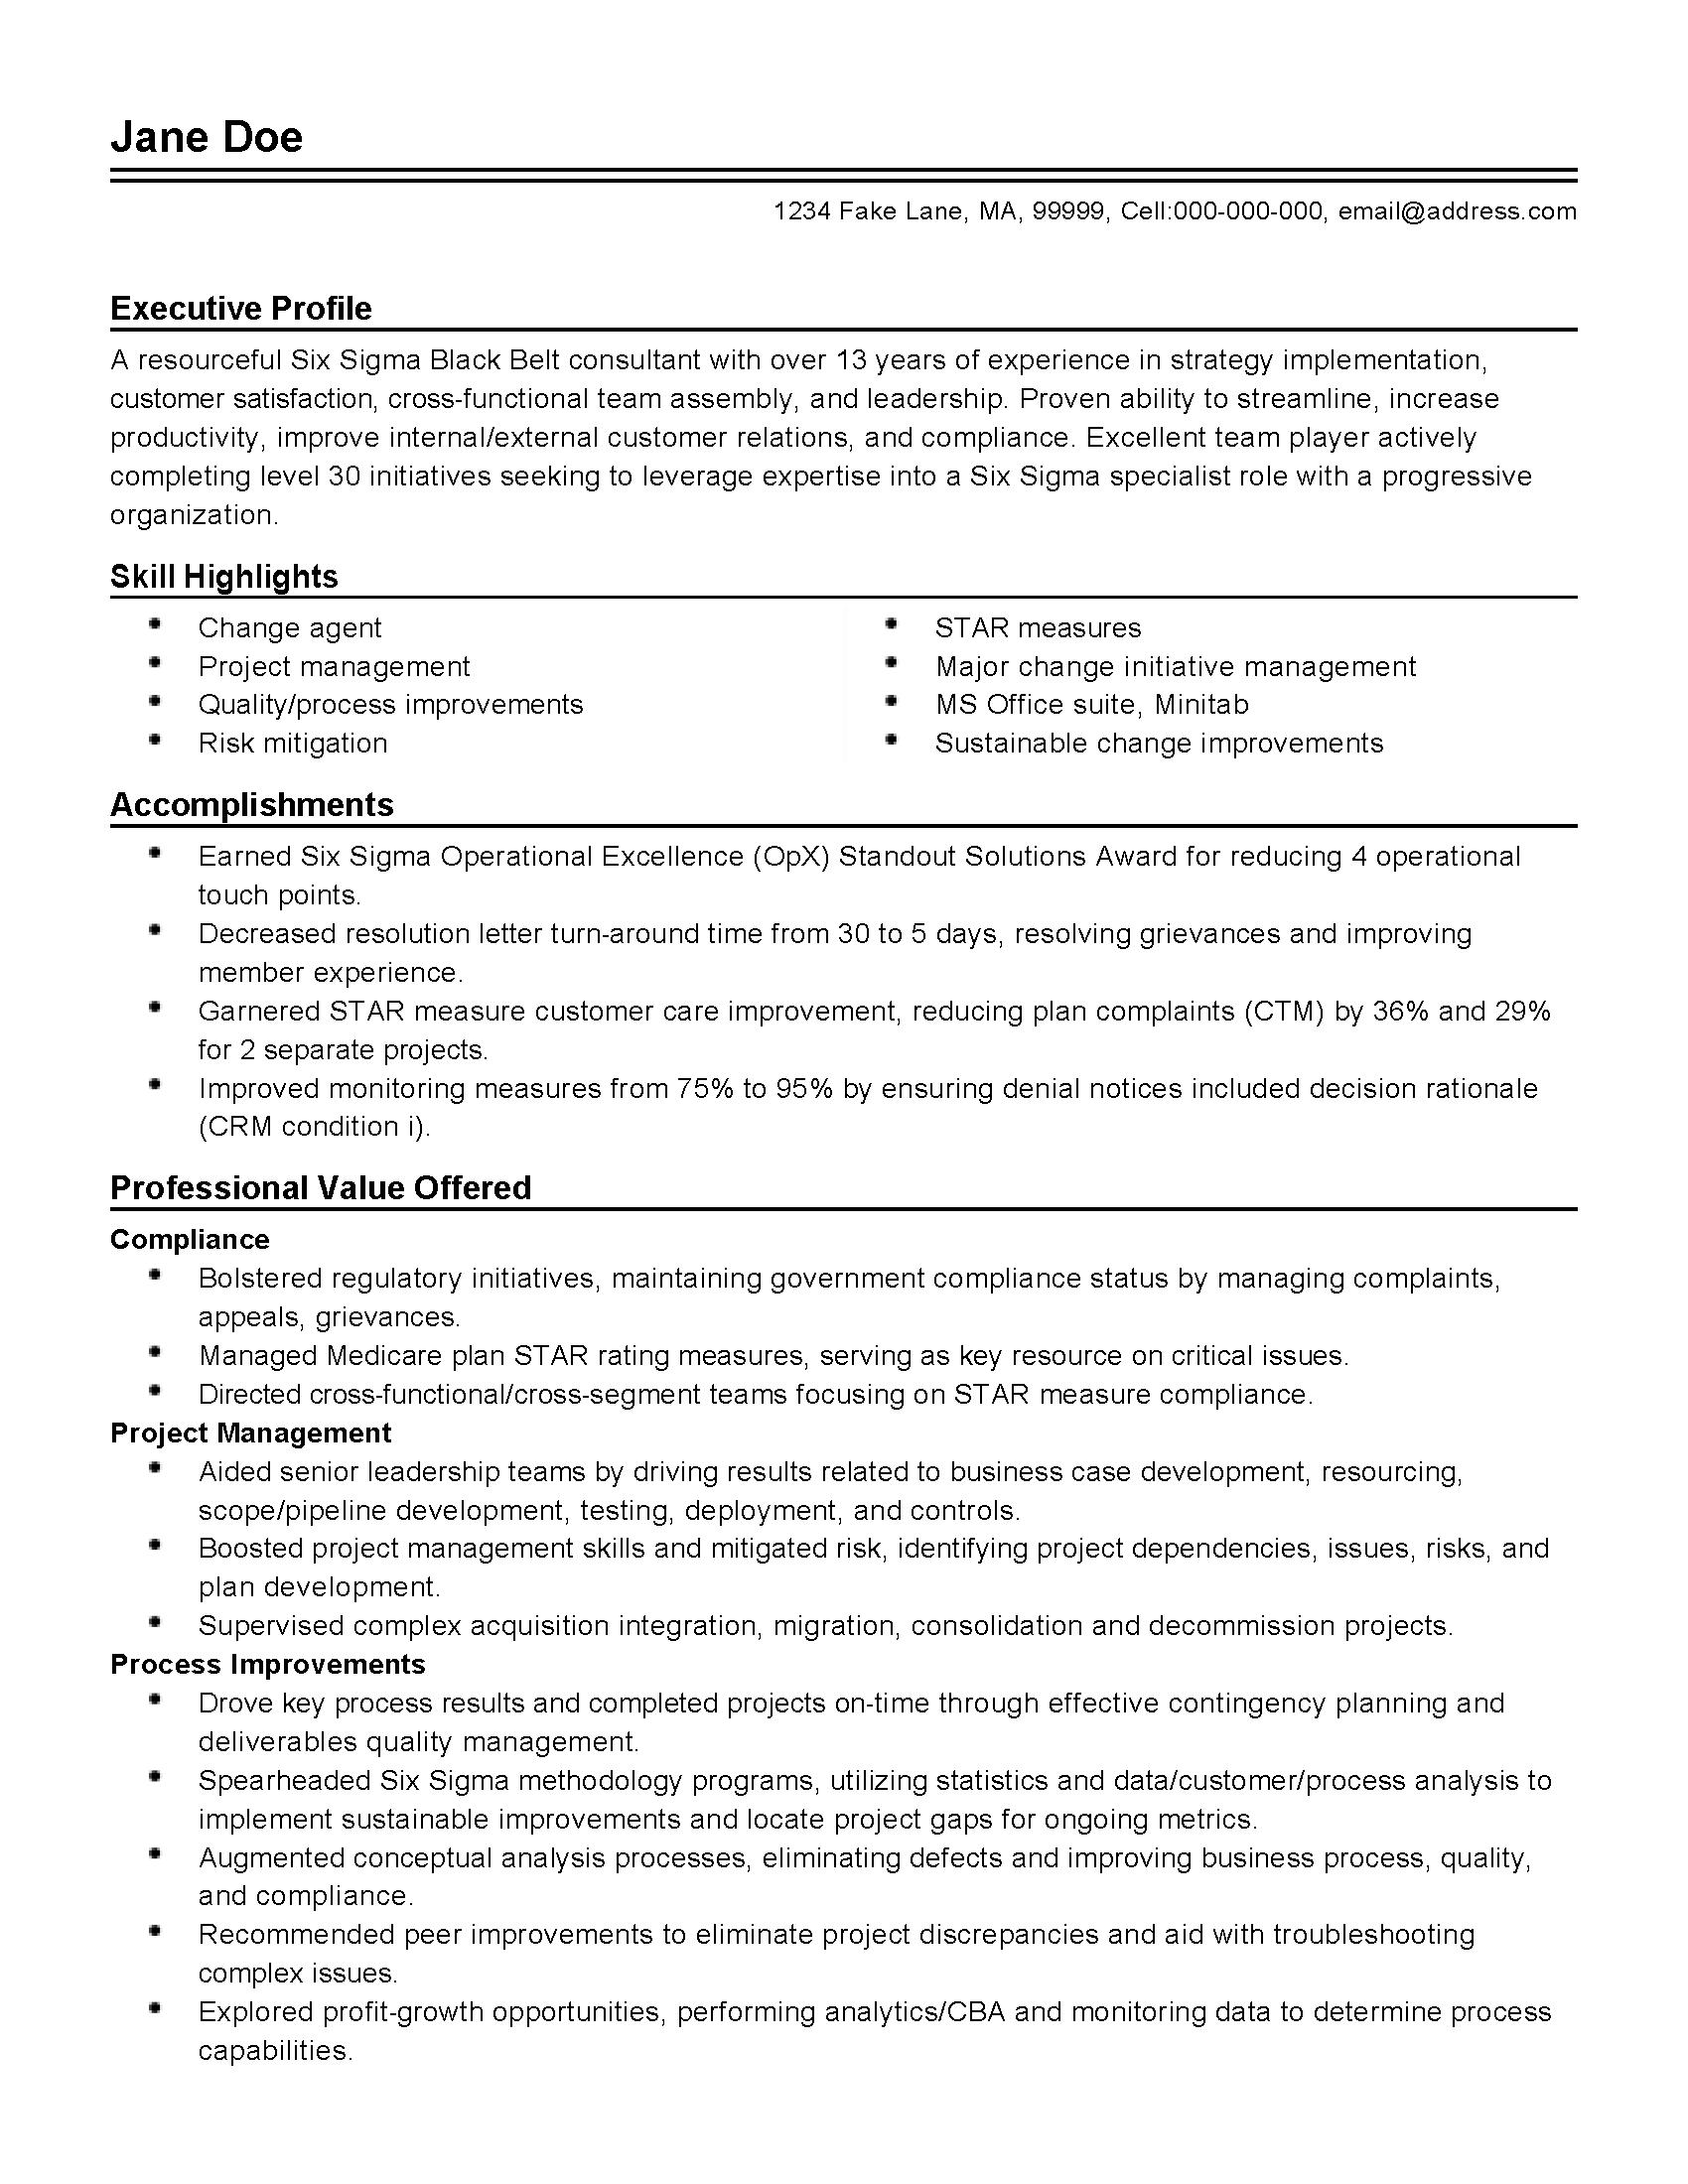 resume writing services phoenix